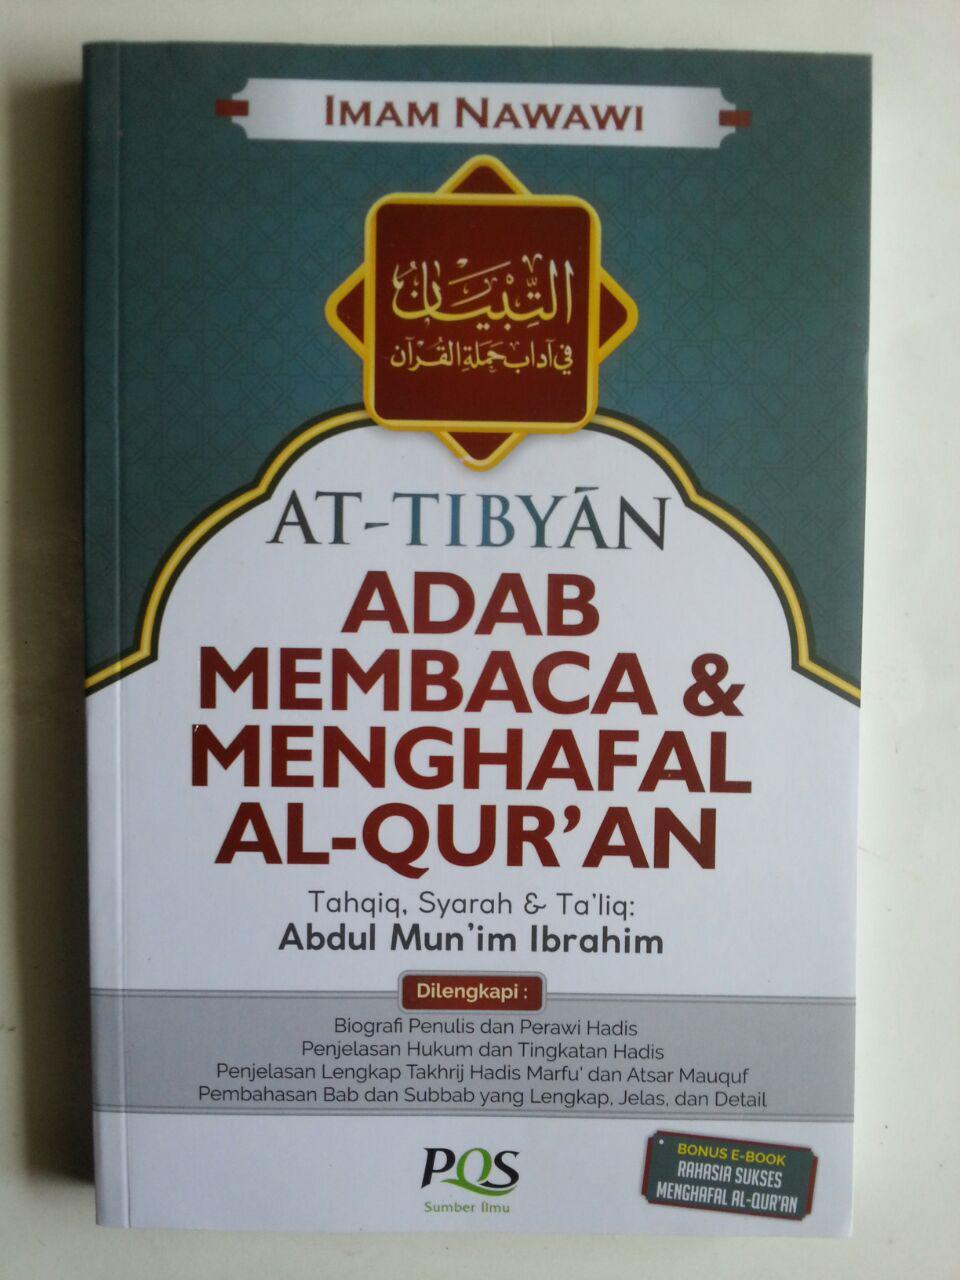 Buku At-Tibyan Adab Membaca Dan Menghafal Al-Qur'an cover 2